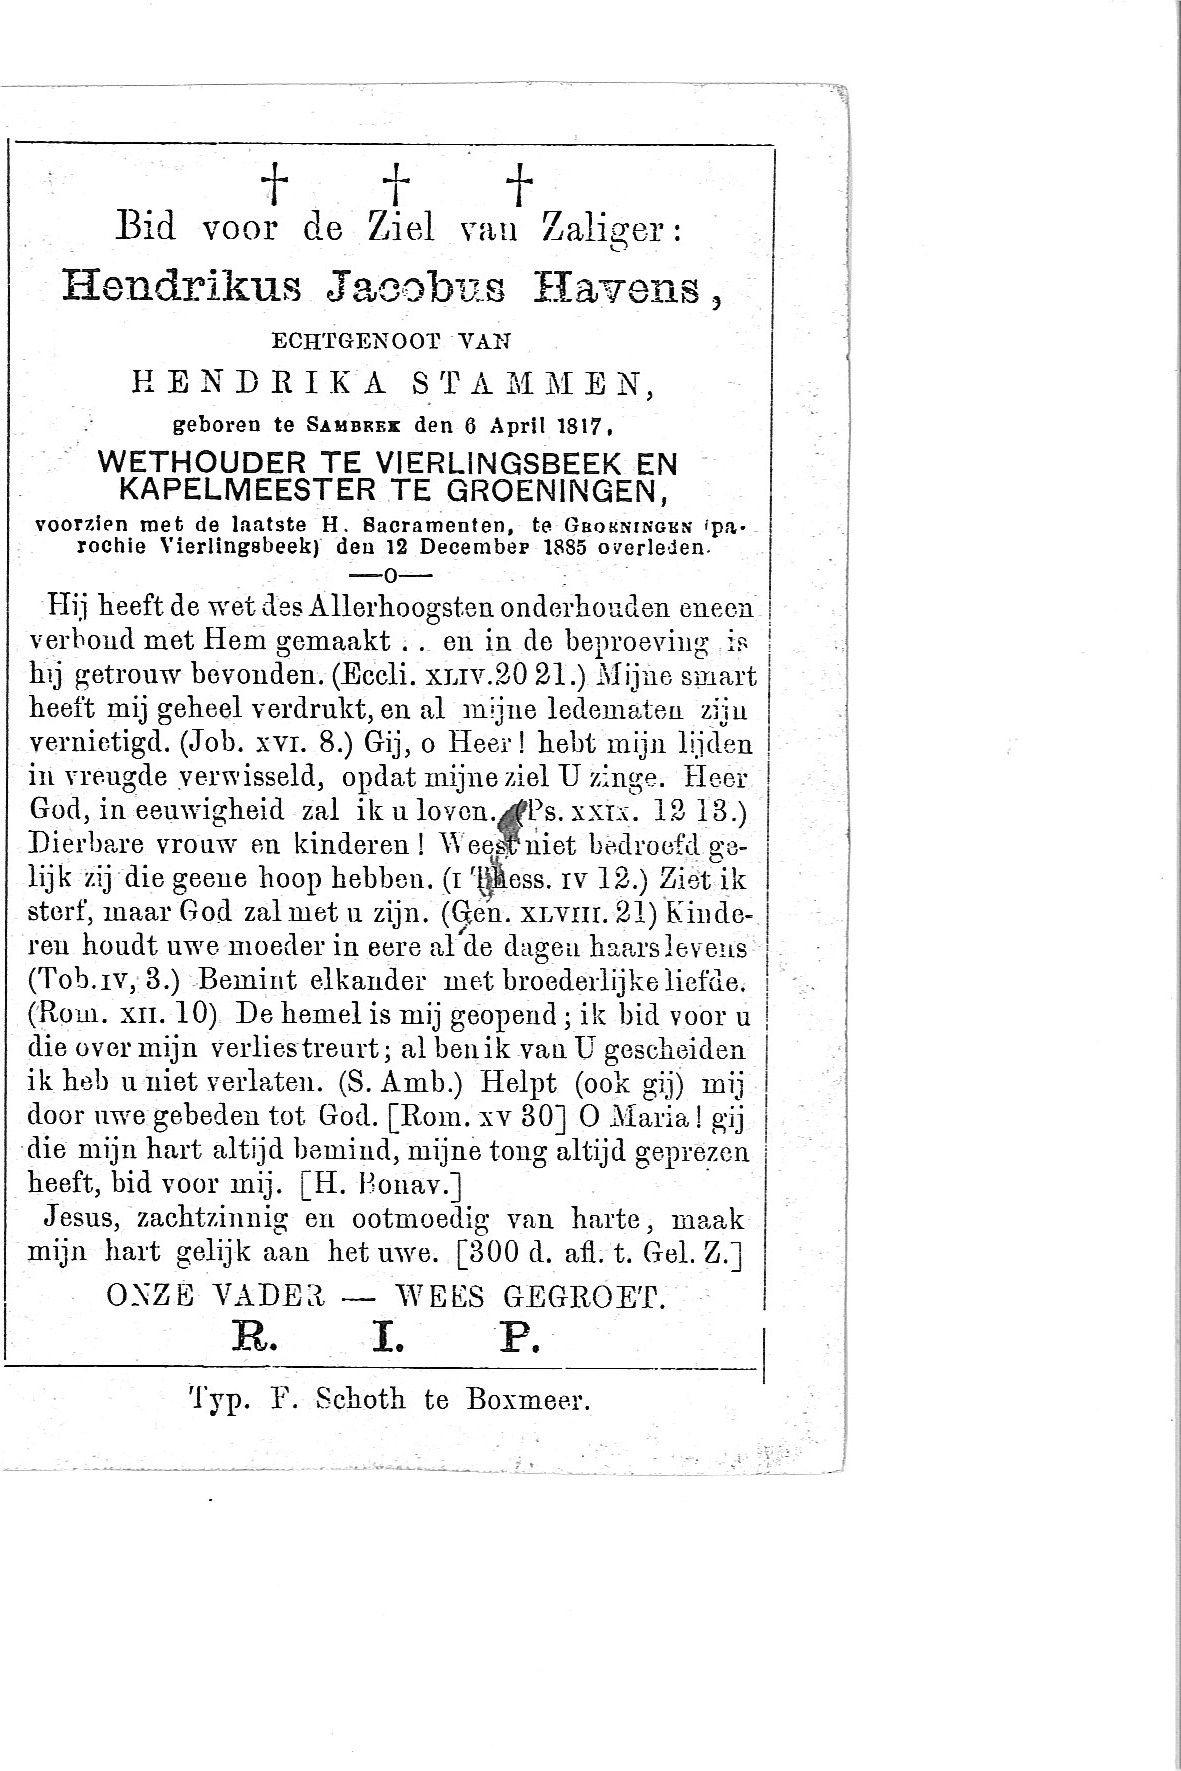 hendrikus-jacobus(1885)20090415141238_00006.jpg